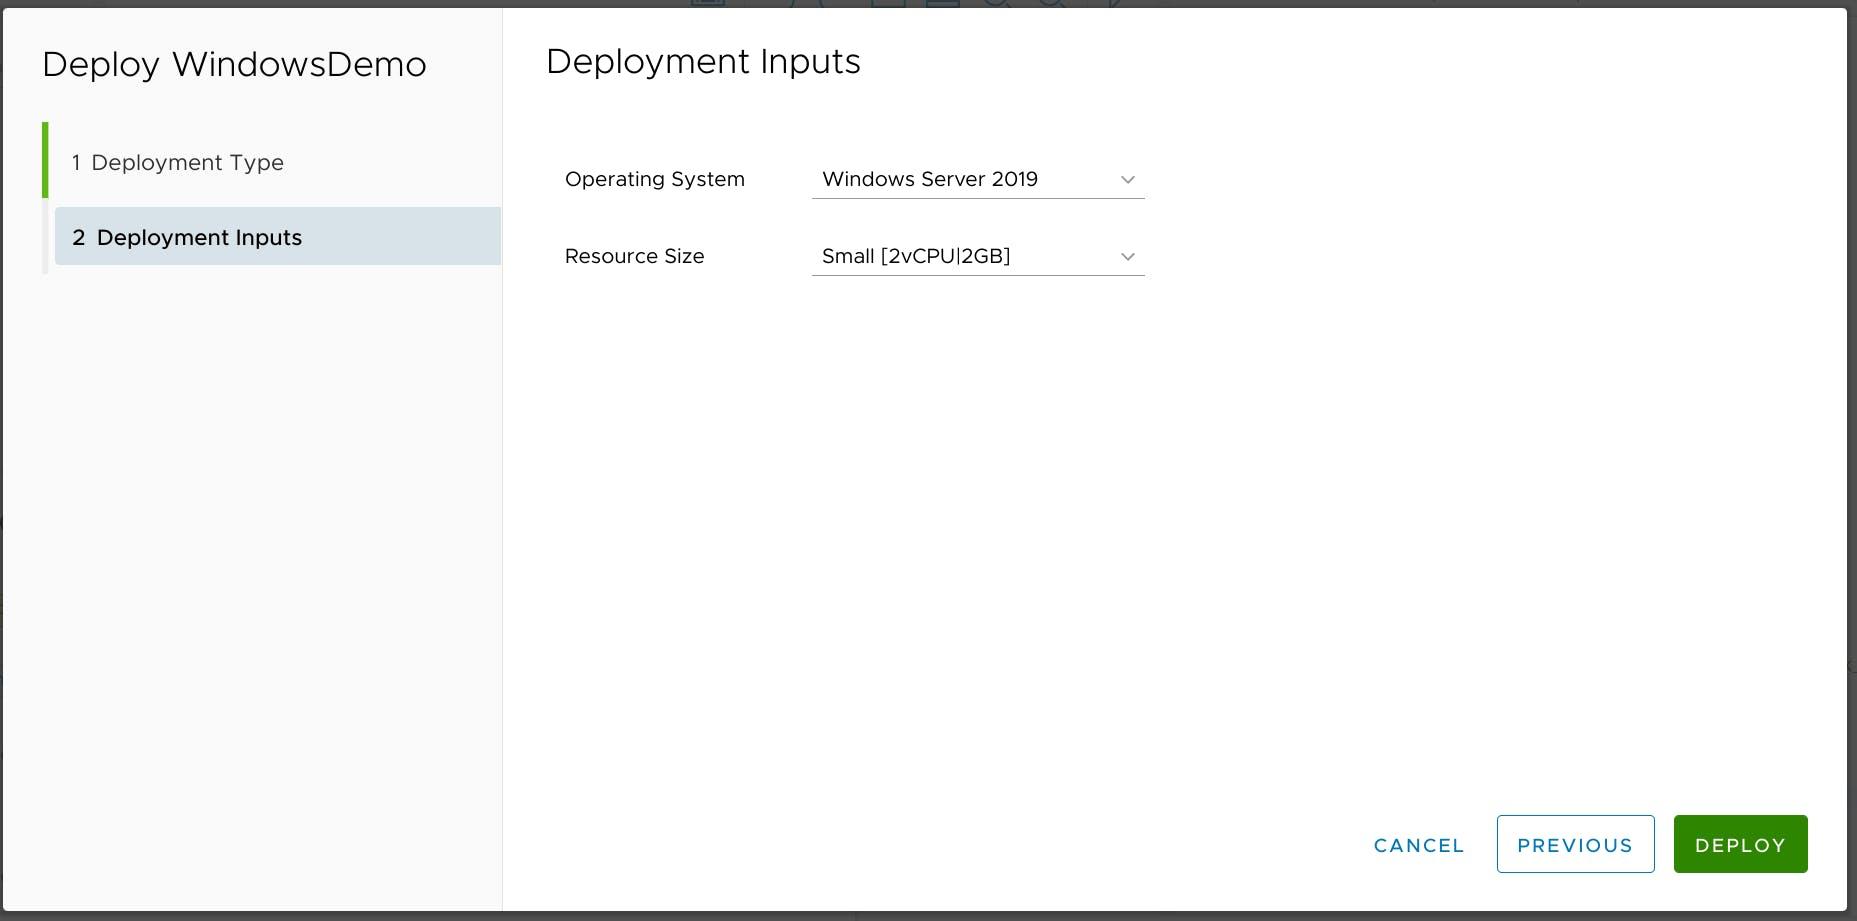 Deployment inputs